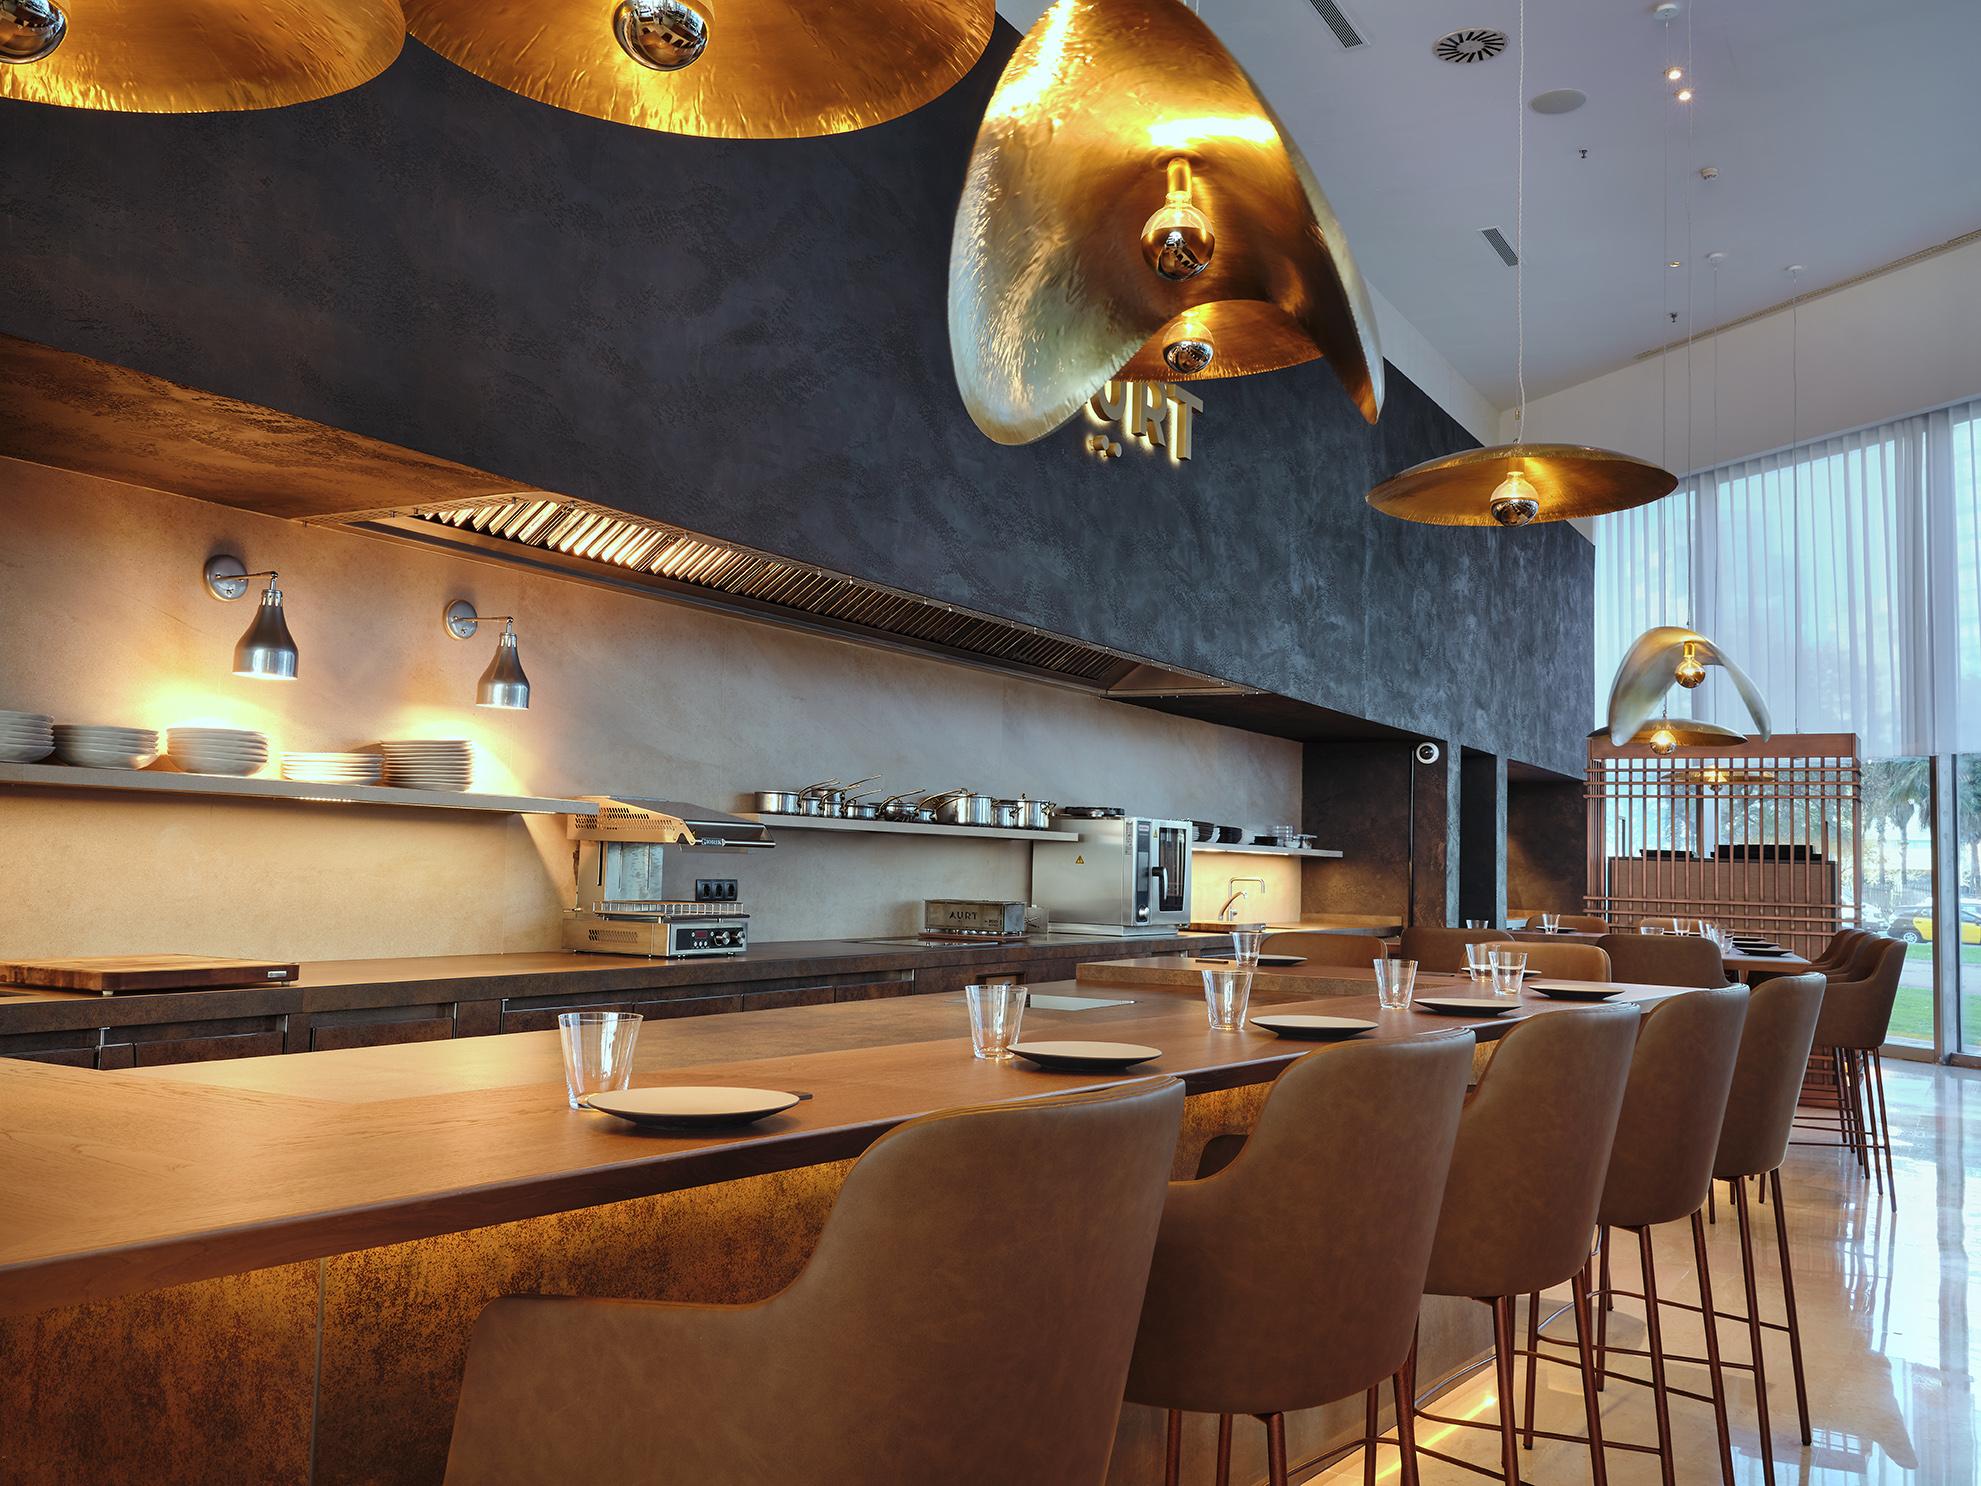 Aurt Restaurant - Night